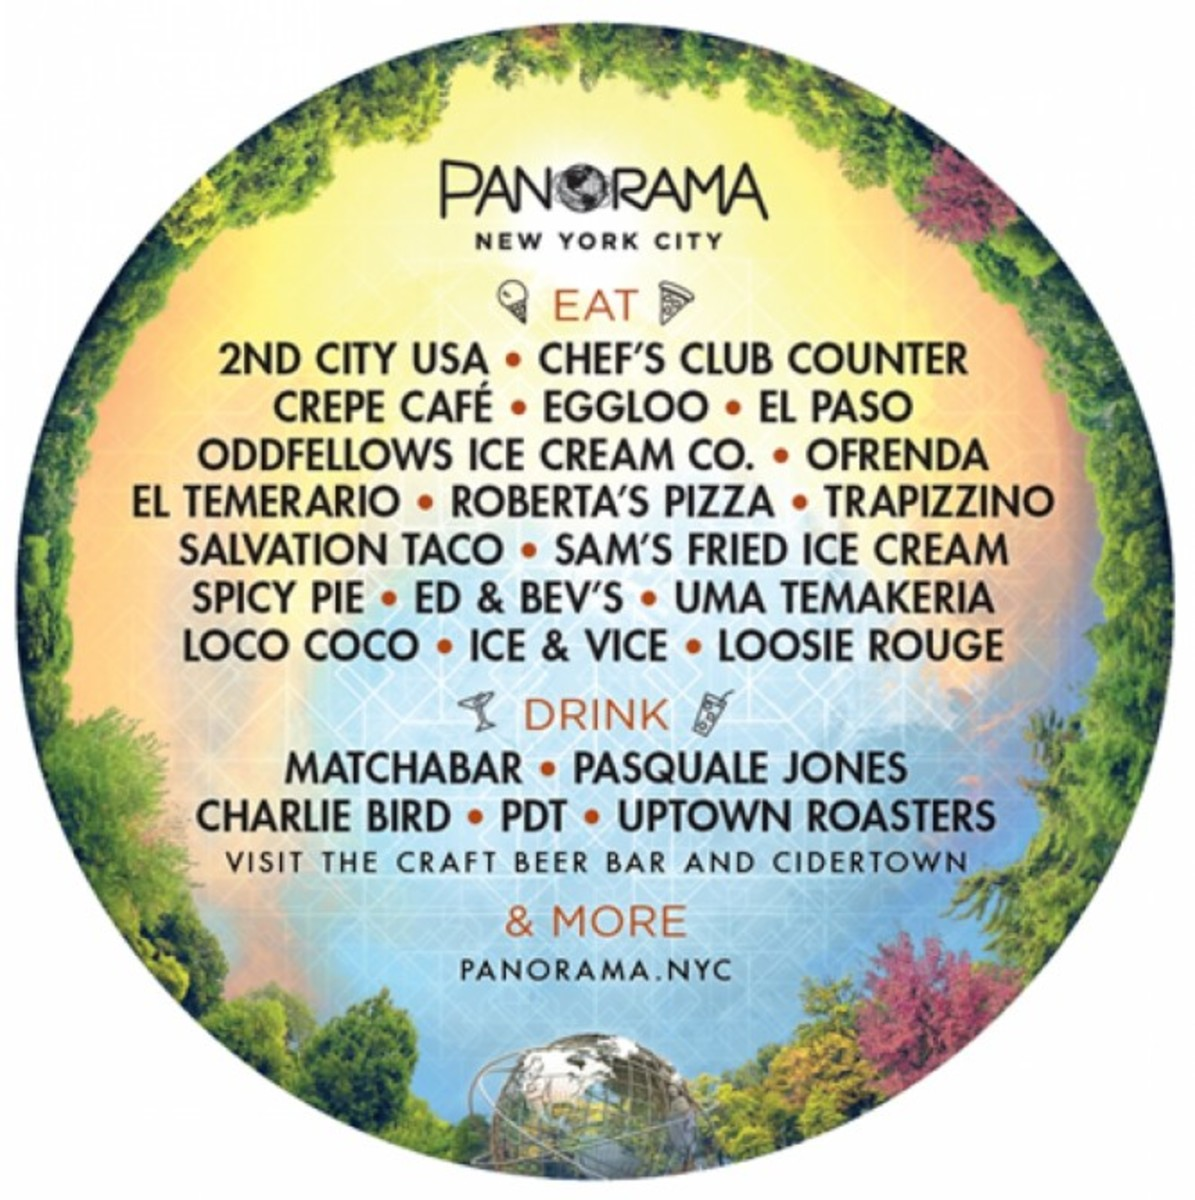 Panorama - Food